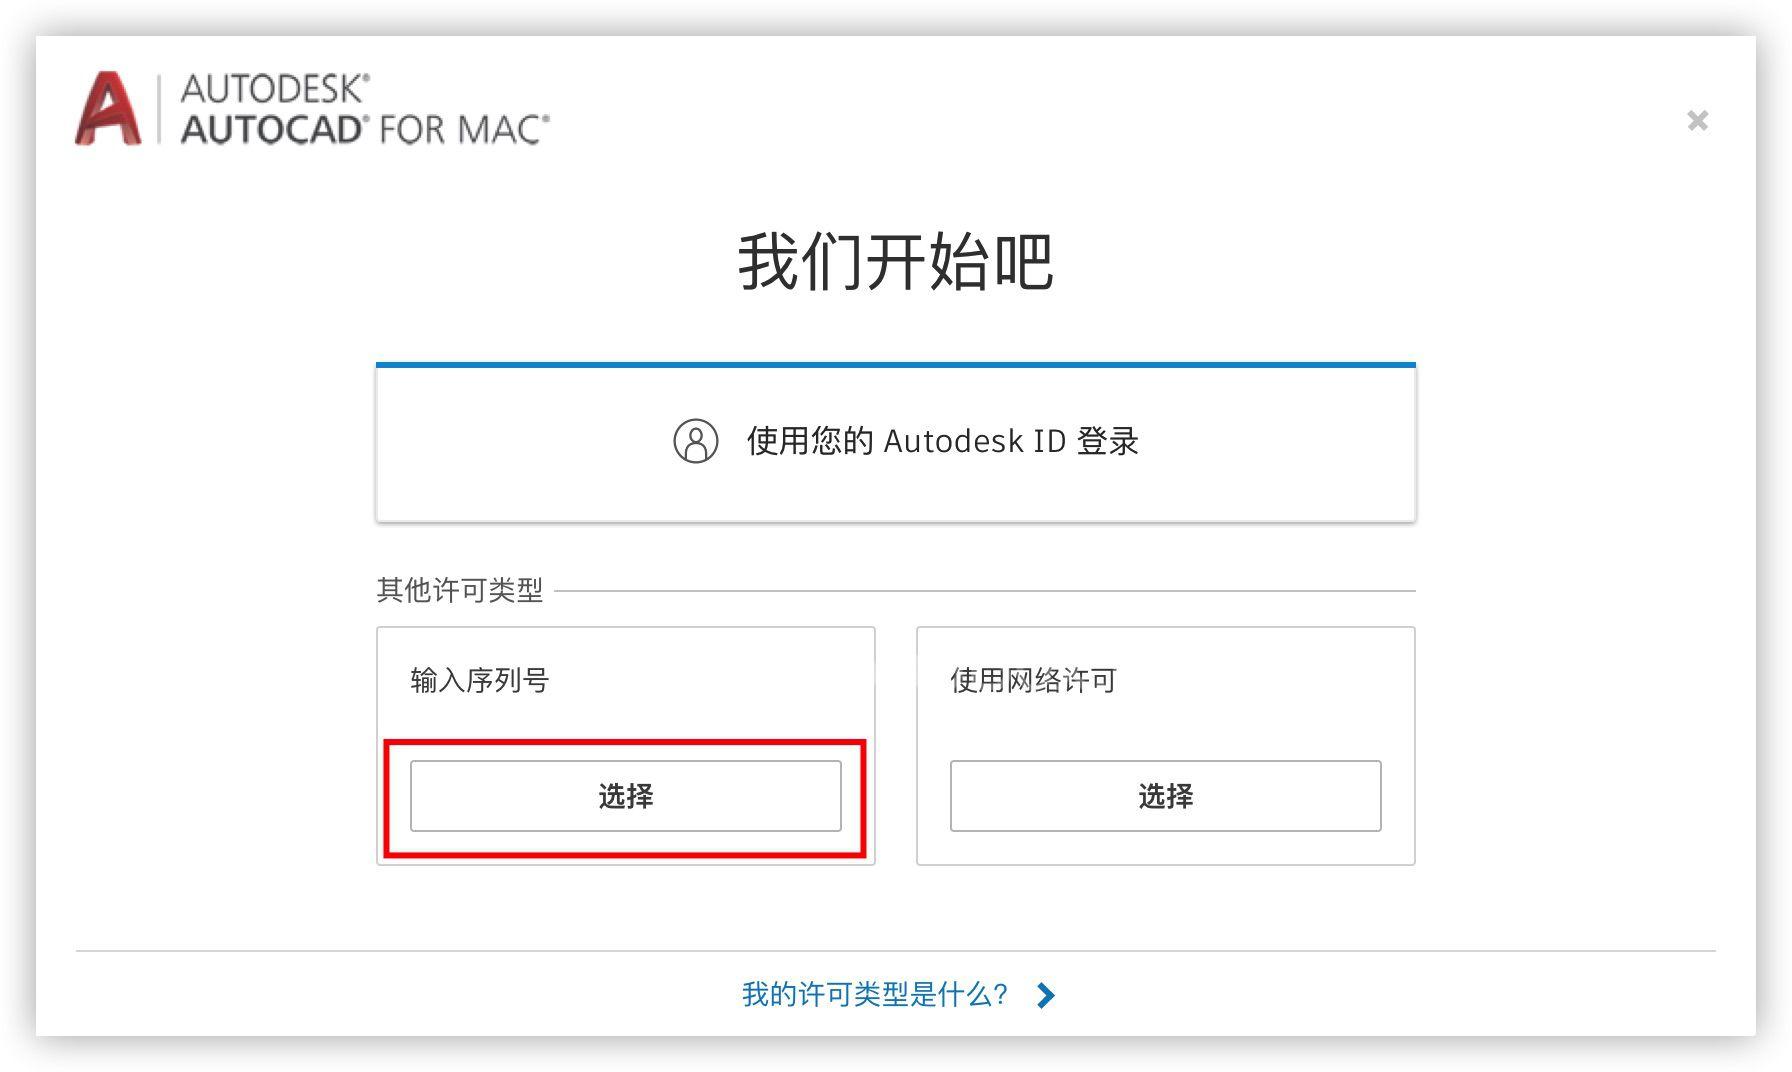 AutoCAD 2021 for mac安装说明